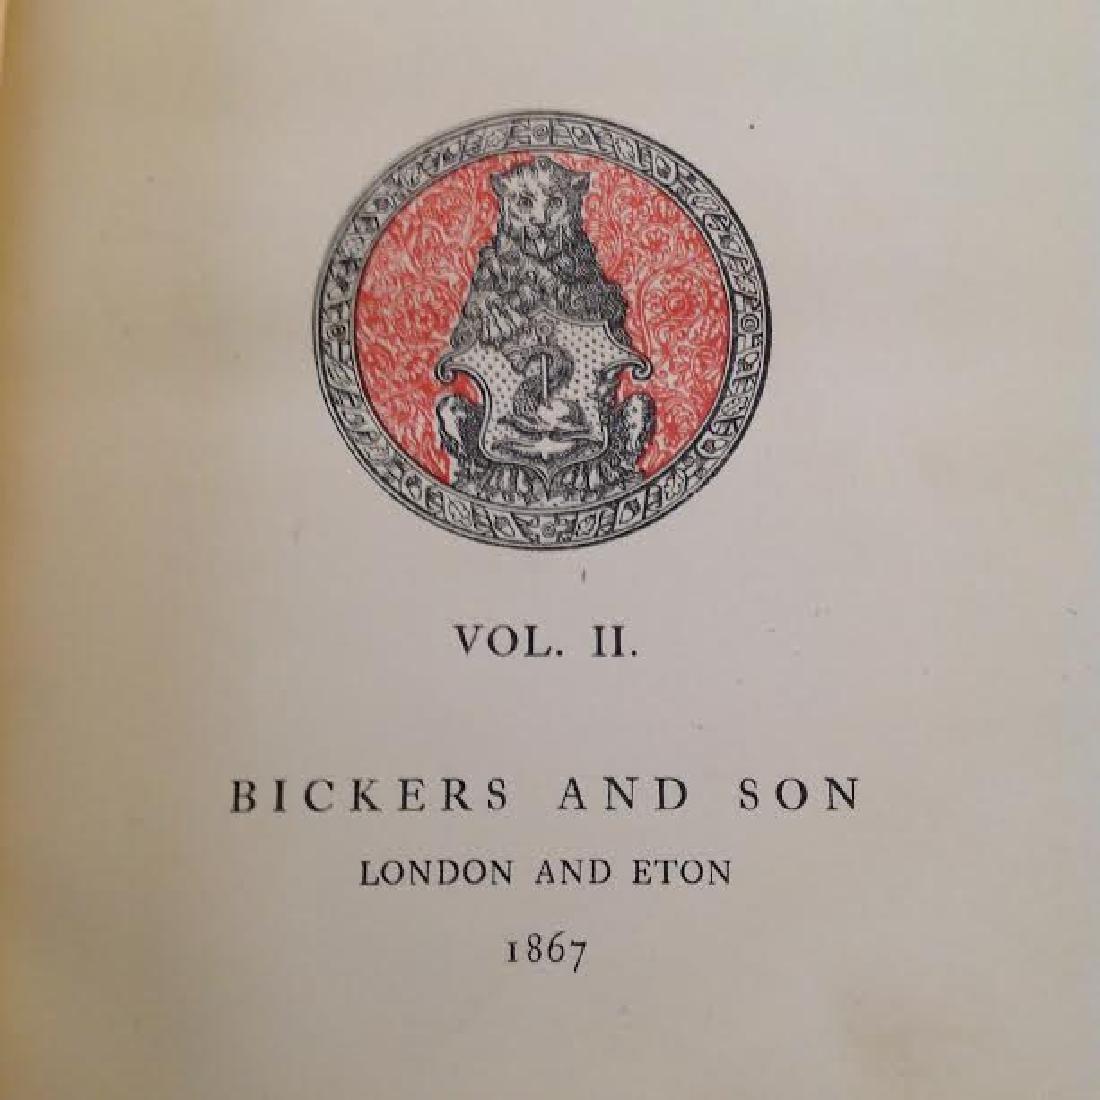 The Poetical Works Of John Milton 1867 Vol.11 - 6